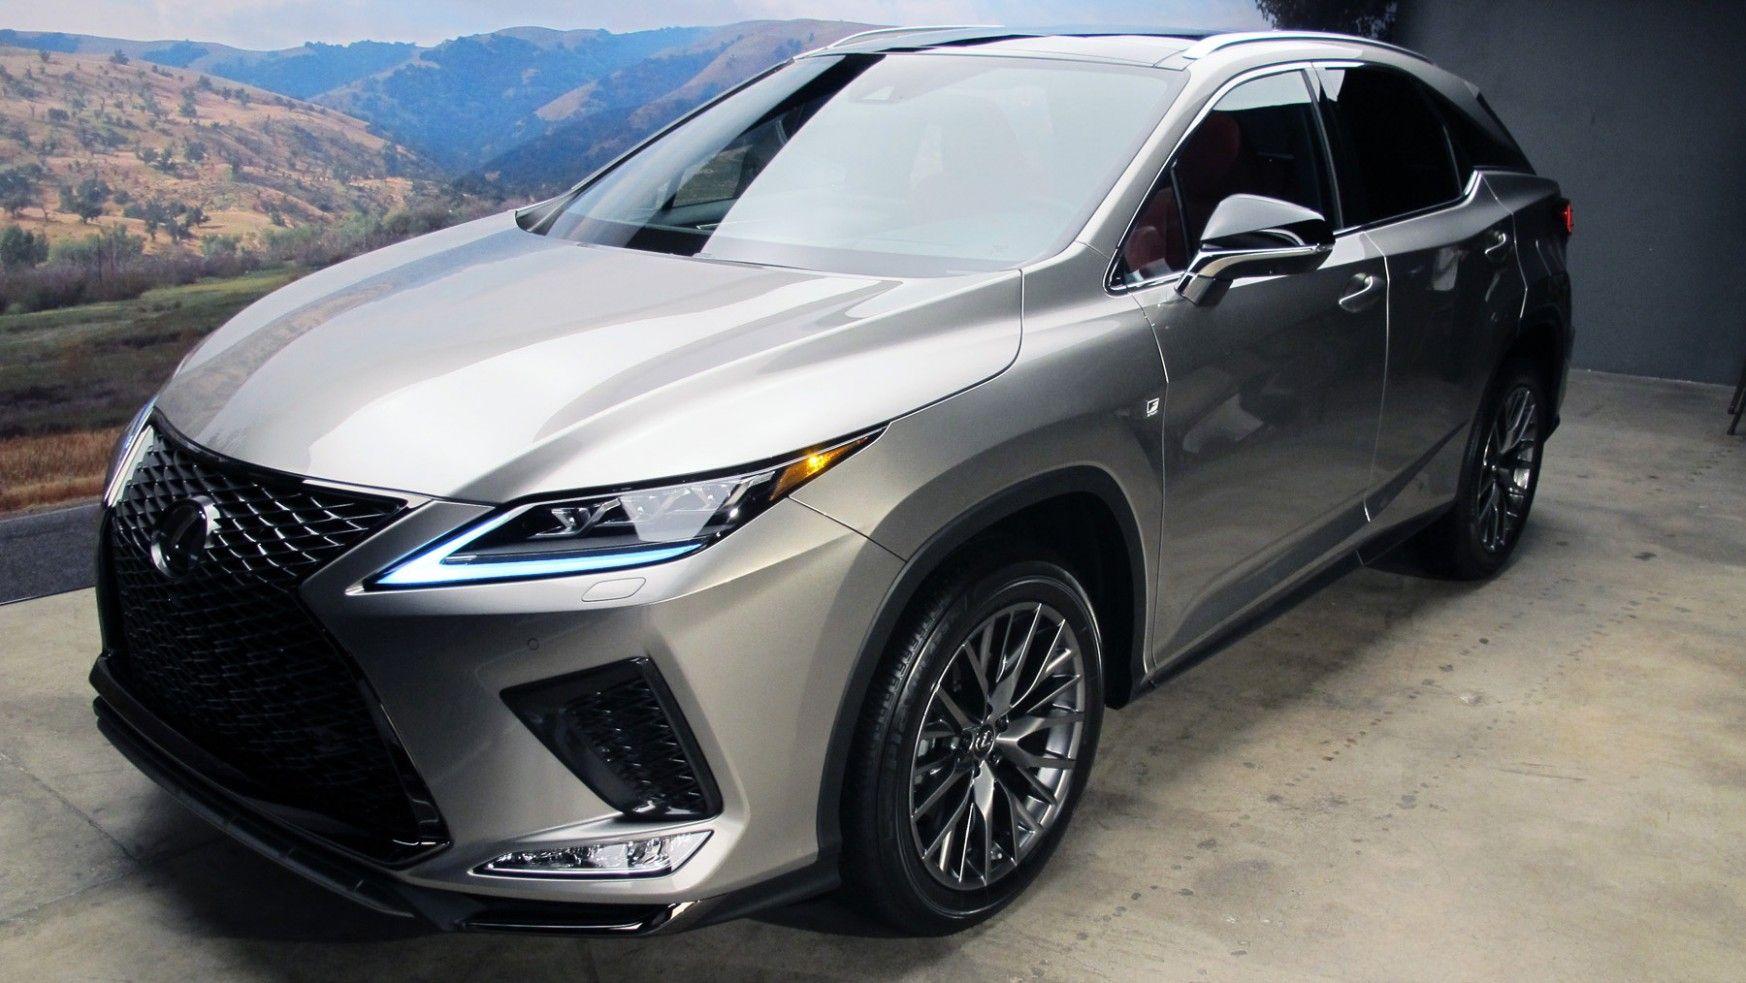 Lexus Rx 2020 Price Images Auto